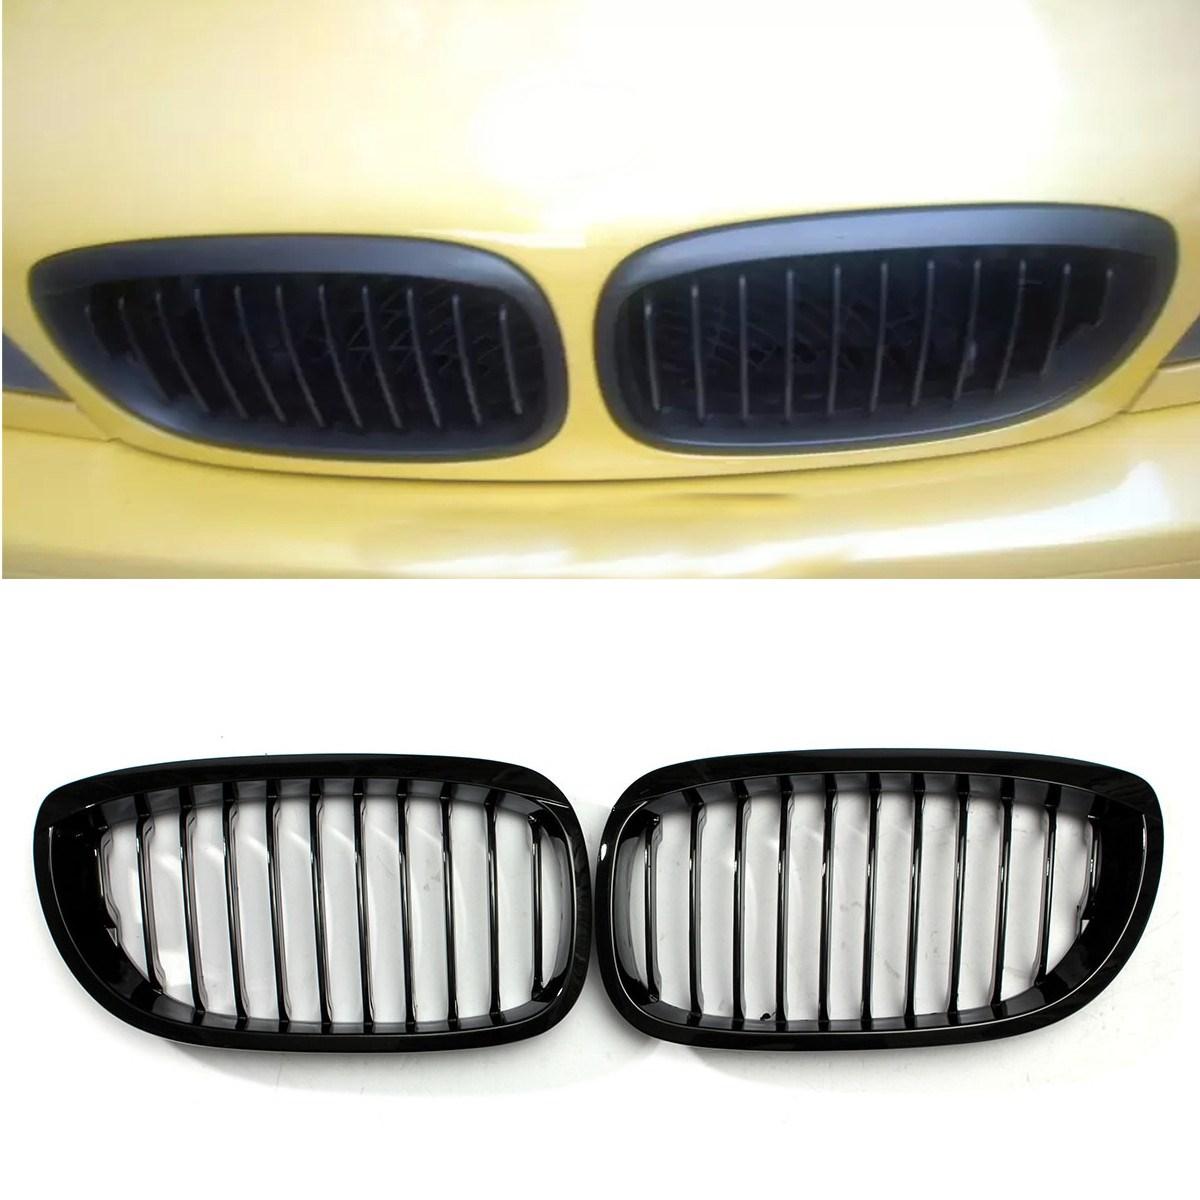 2Pcs Gloss Black Kidney Grille Grill For BMW E46 3-Series 2Dr Coupe Cabriolet 2002 2003 2004 2005 2006 1pair matt black front sport kidney grill grille for bmw e85 e86 z4 coupe convertible 2003 2004 2005 2006 2007 2 door d25